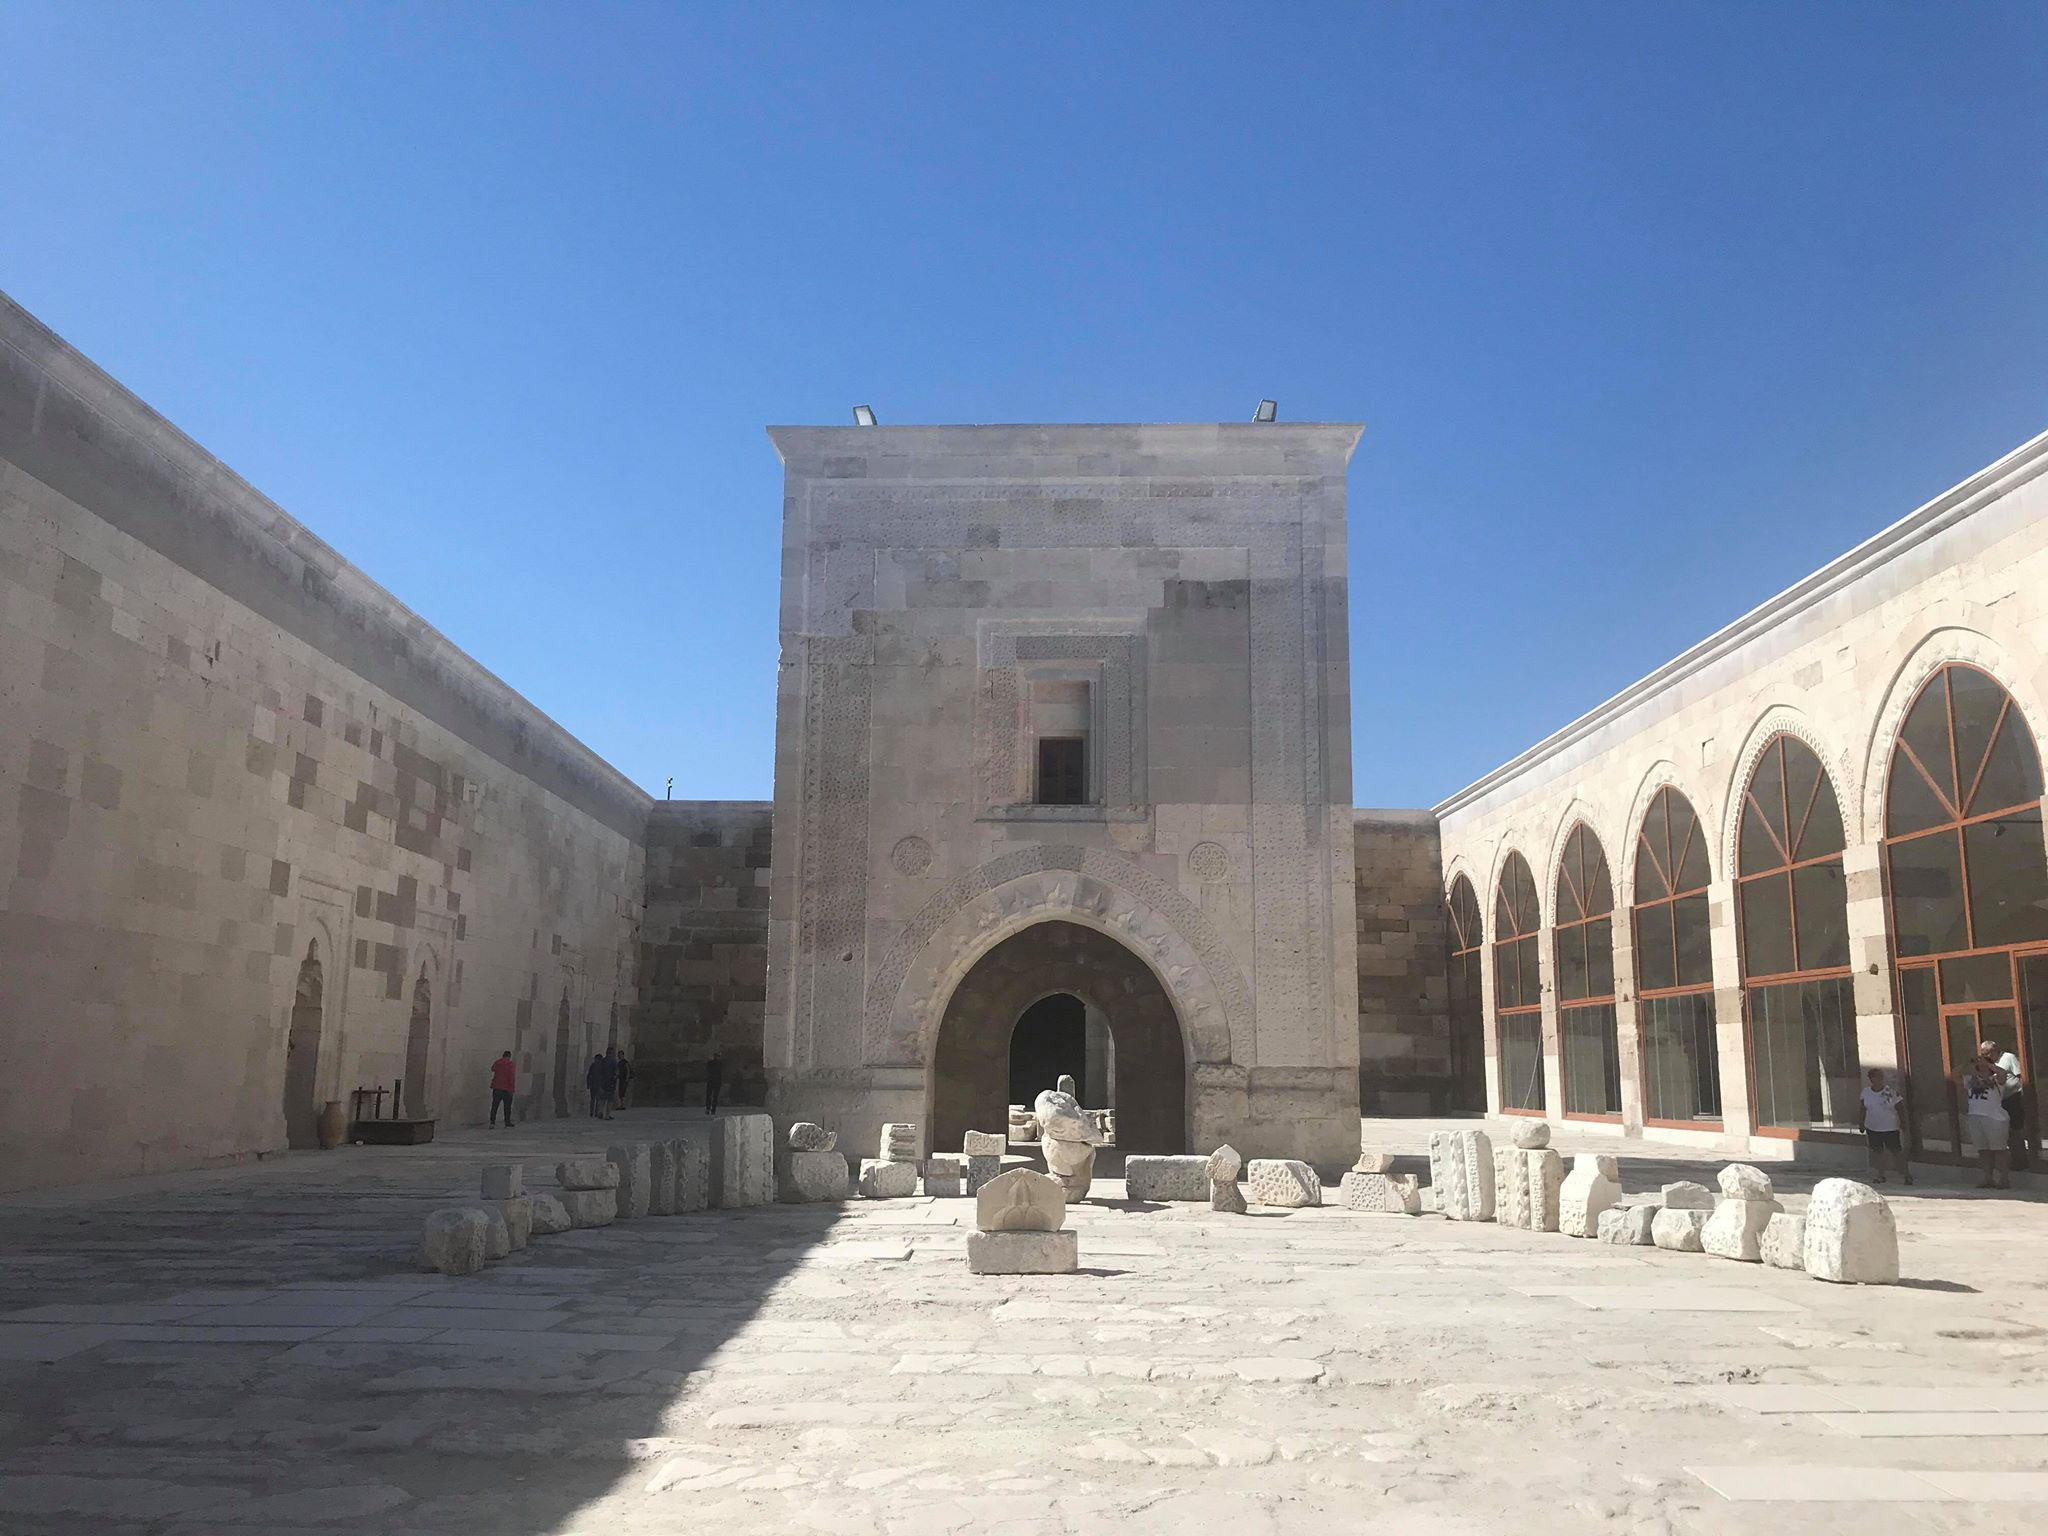 sultanhani karavanestation, sultan hani karavanestation, hvad er en karavanestation, silkevejen karavanestationer, oplevelser i Aksaray, oplevelser i kappadokien, billige oplevelser i kappadokien, seværdigheder i kappadokien, cappadocia, tyrkiets største karavanestation